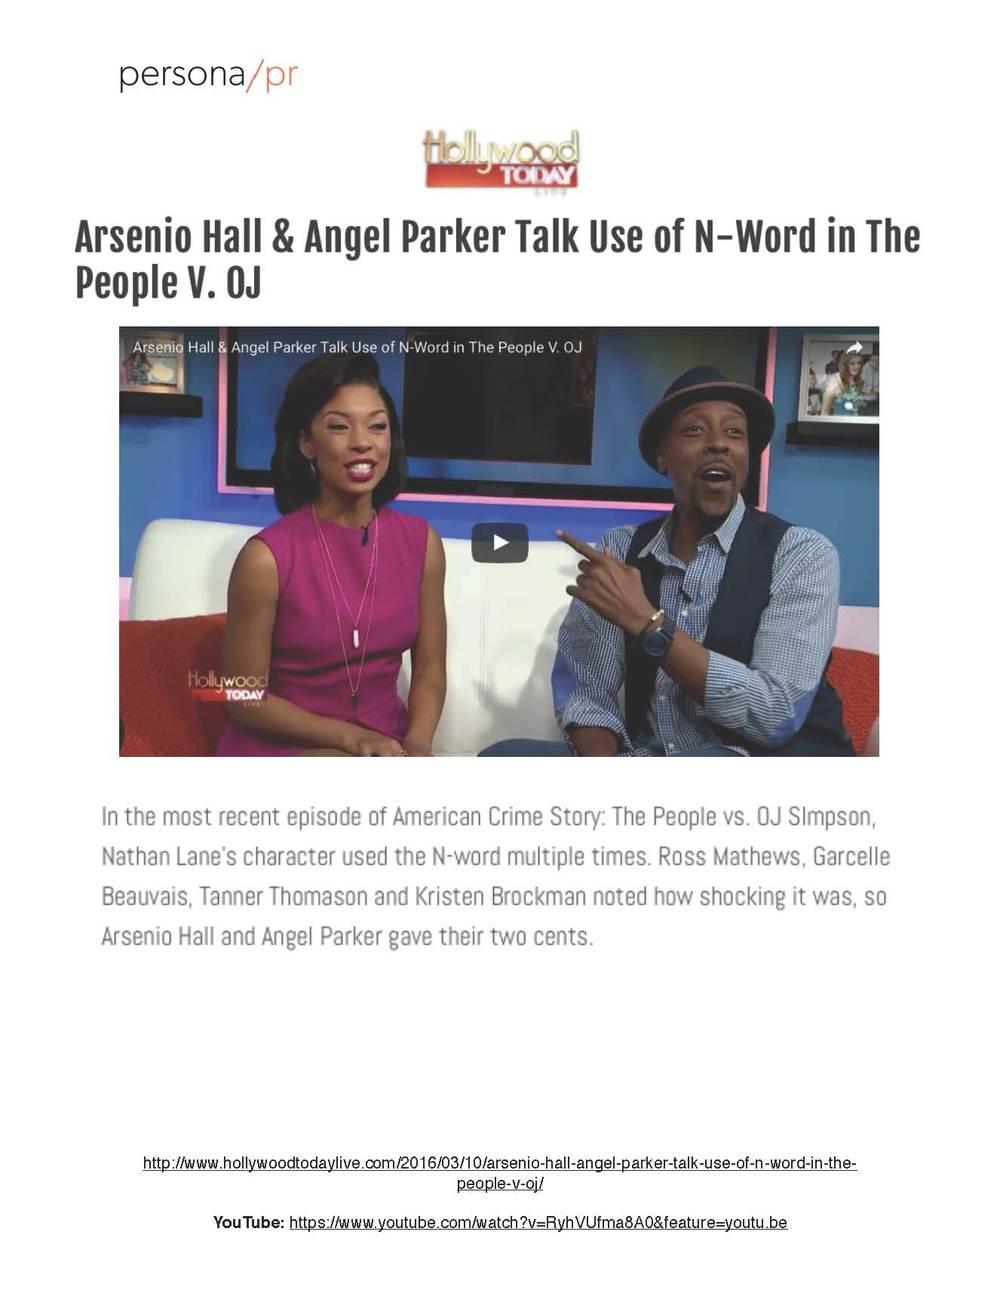 AngelParker-HollywoodTodayLive-03.10.16_Page_1.jpg